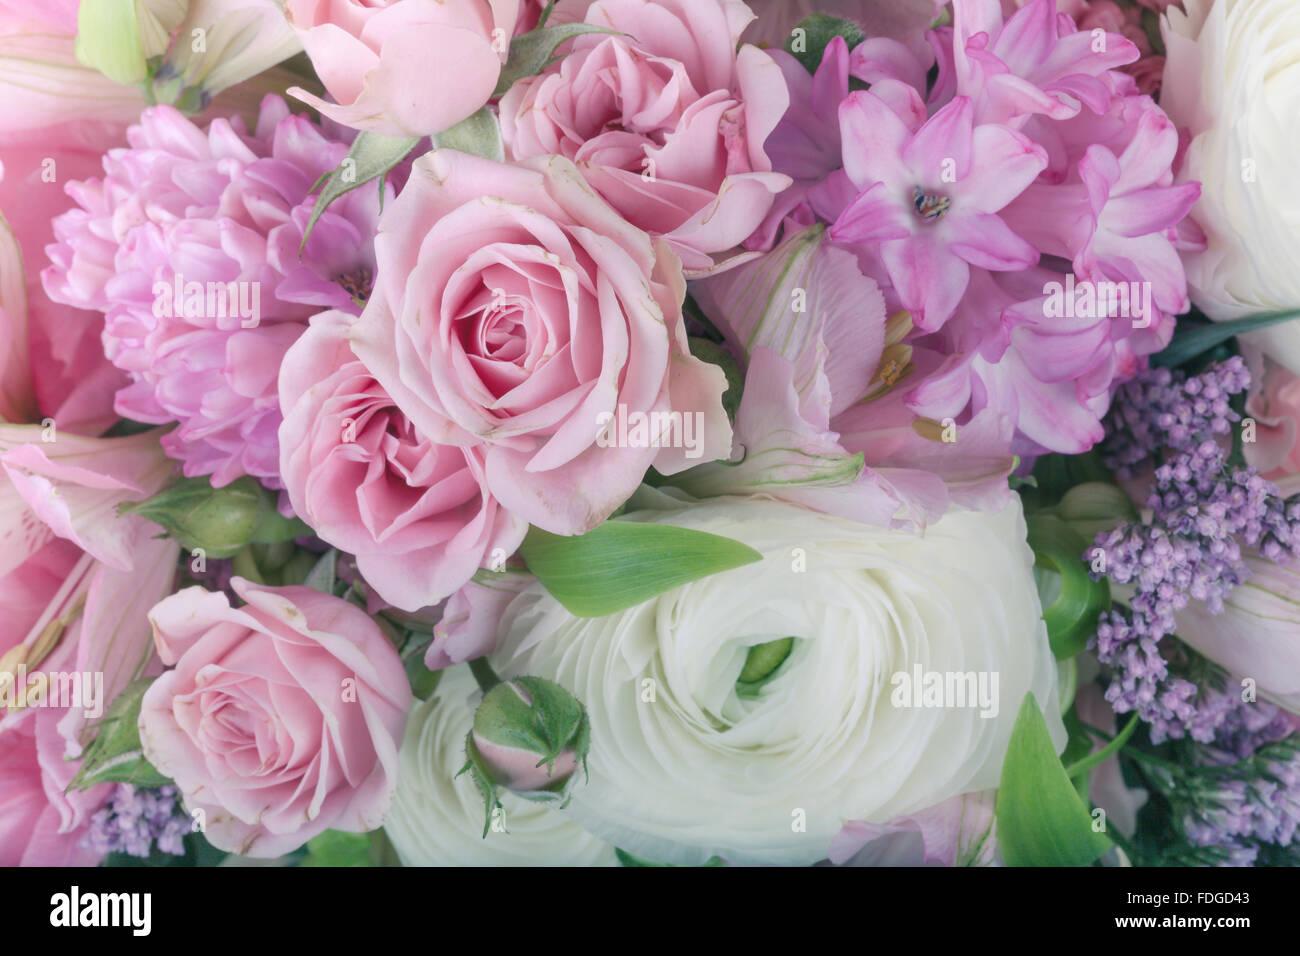 Amazing flower bouquet arrangement close up in pastel colors stock amazing flower bouquet arrangement close up in pastel colors izmirmasajfo Gallery